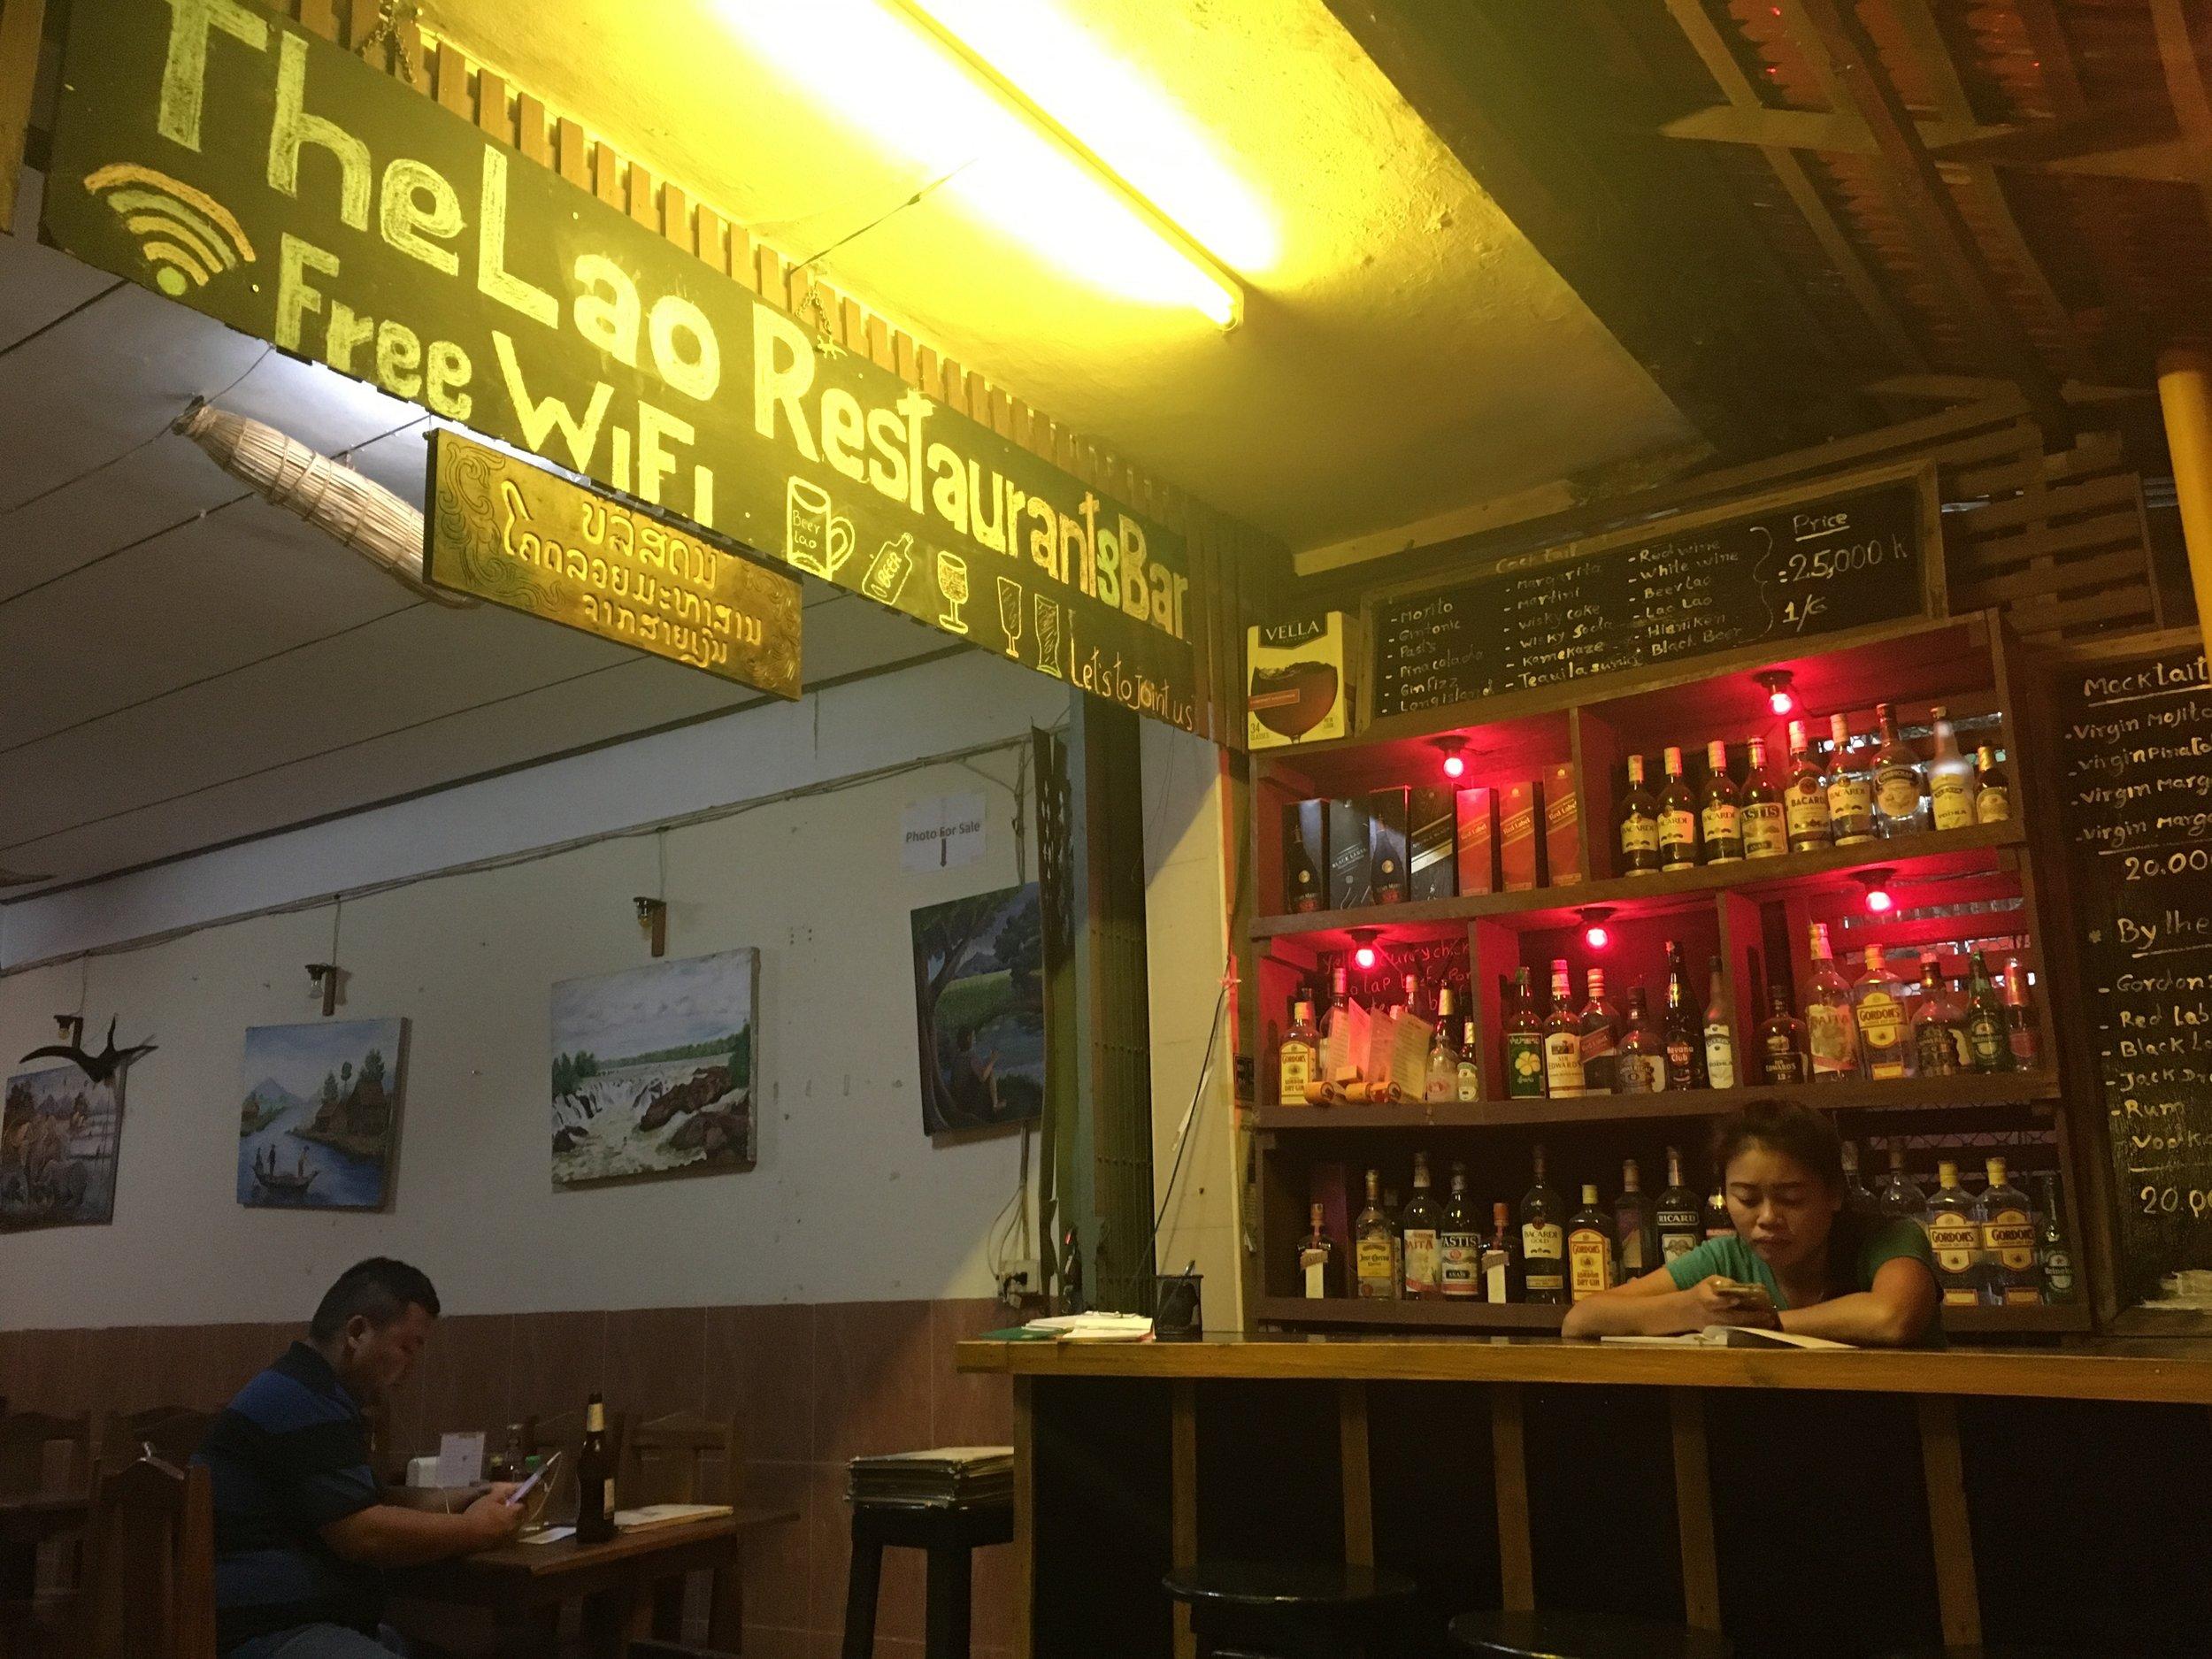 The Lao Restaurant and Bar | ©Regina Beach